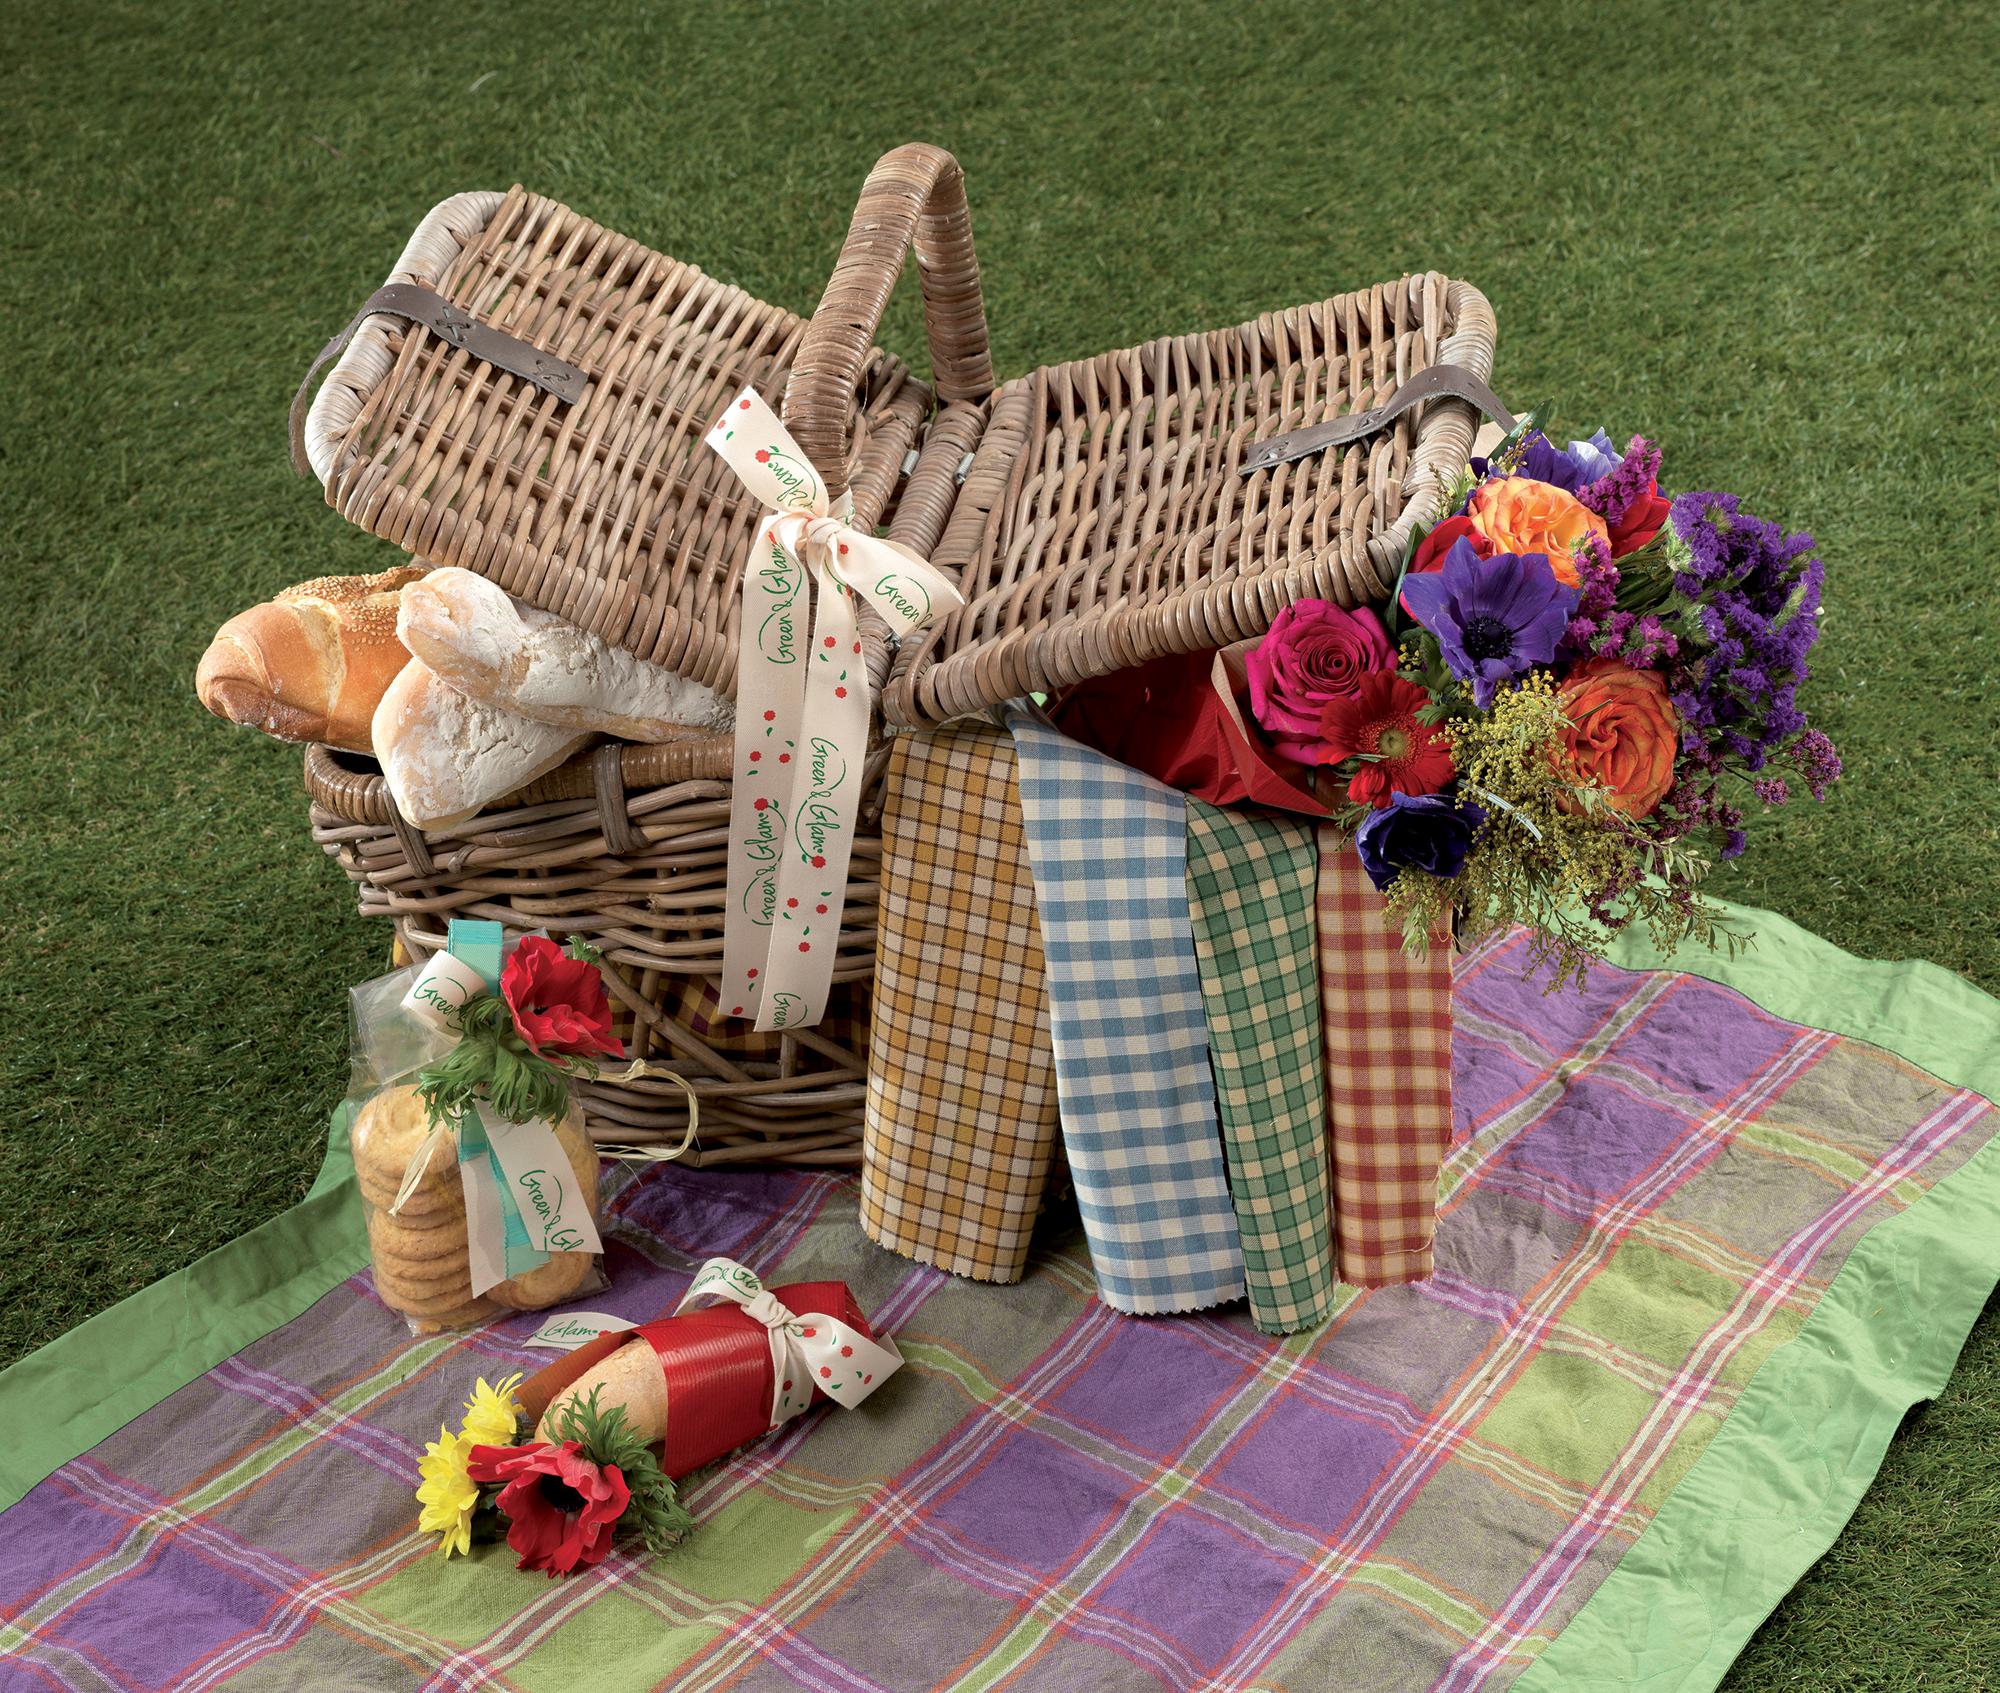 Green&Glam ideas #greenglam #la5green #Flowerfashionfood #ideas #creative #inspirational